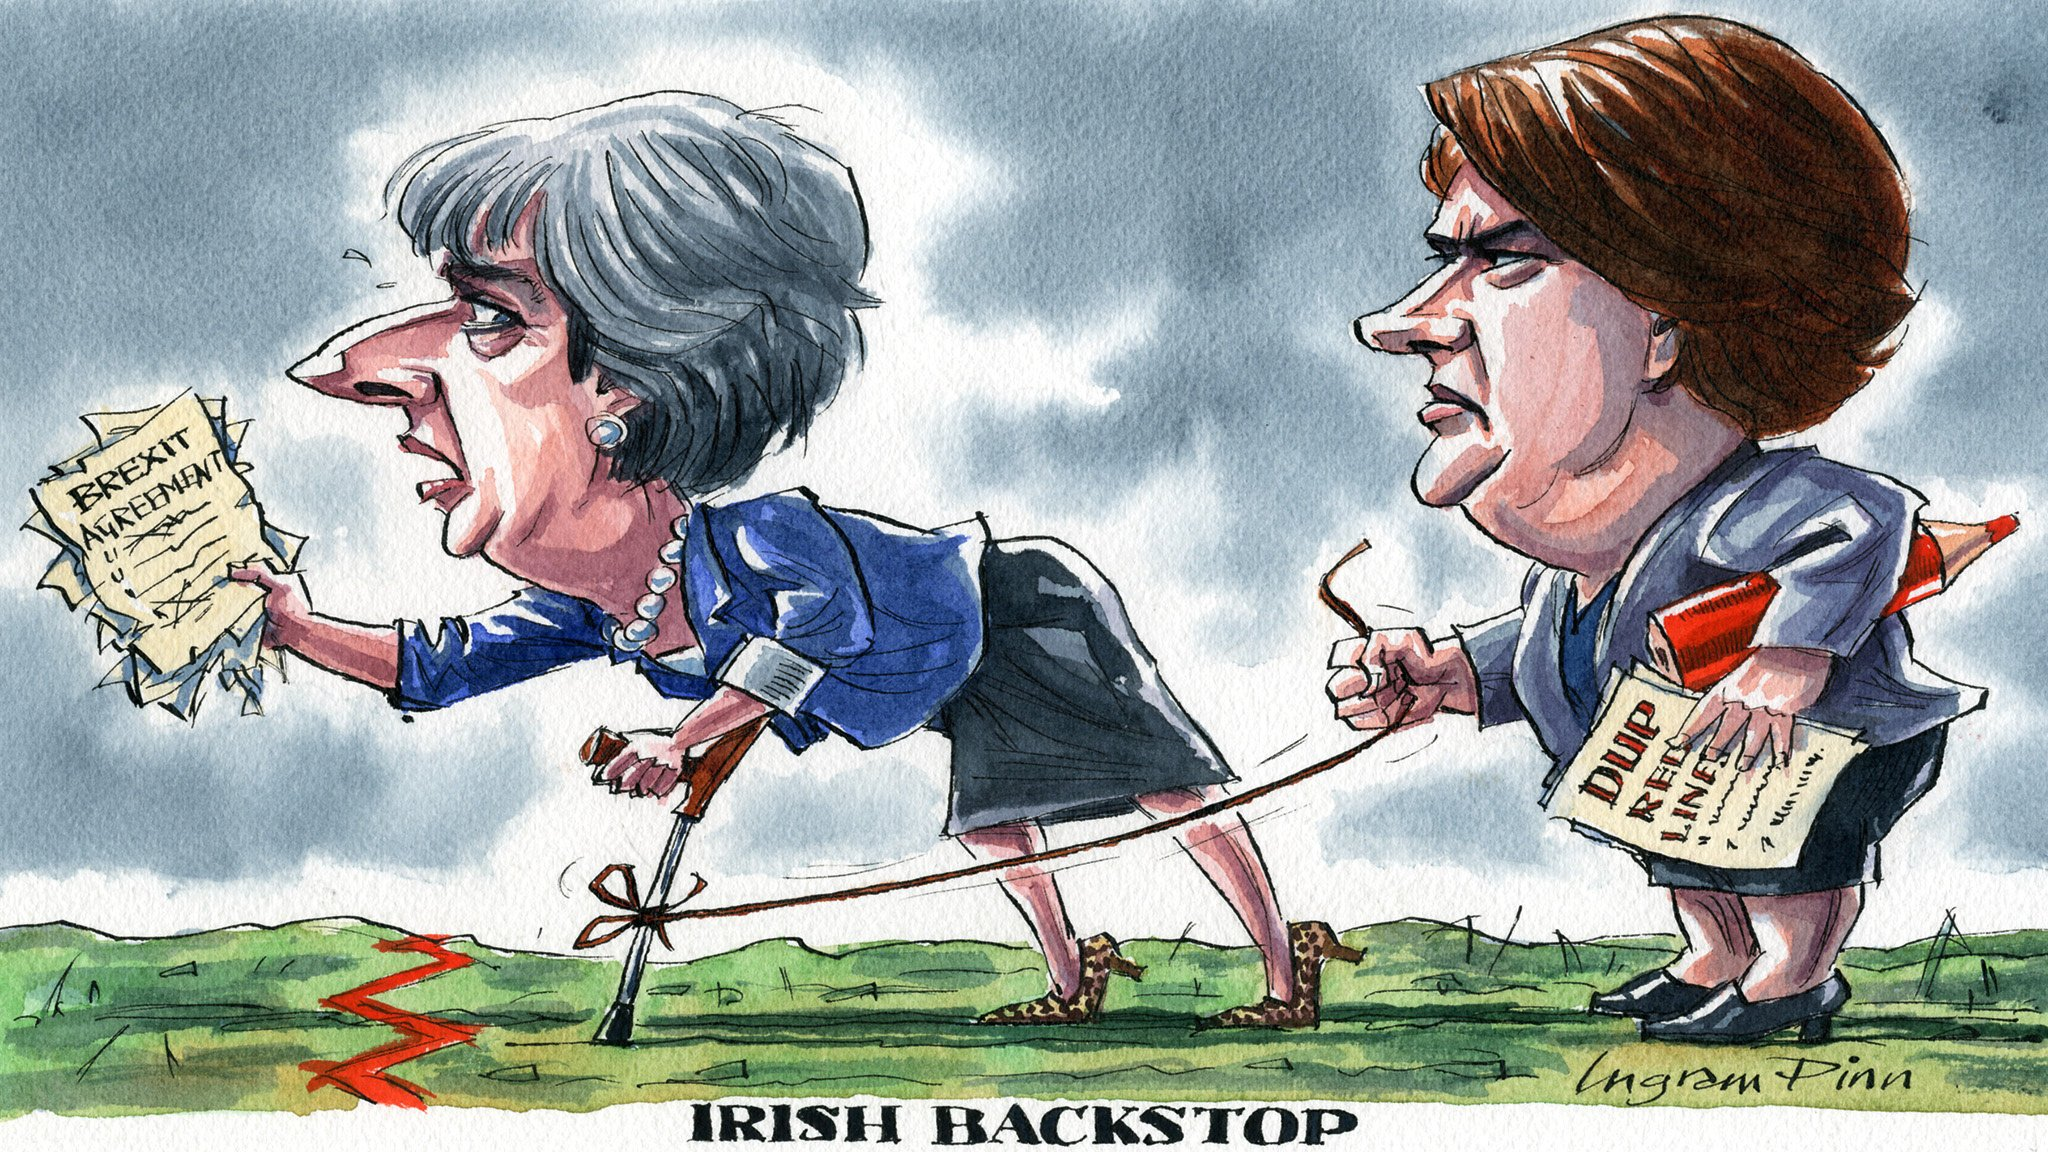 Backstop Cartoon by Ingram Pinn.jpg